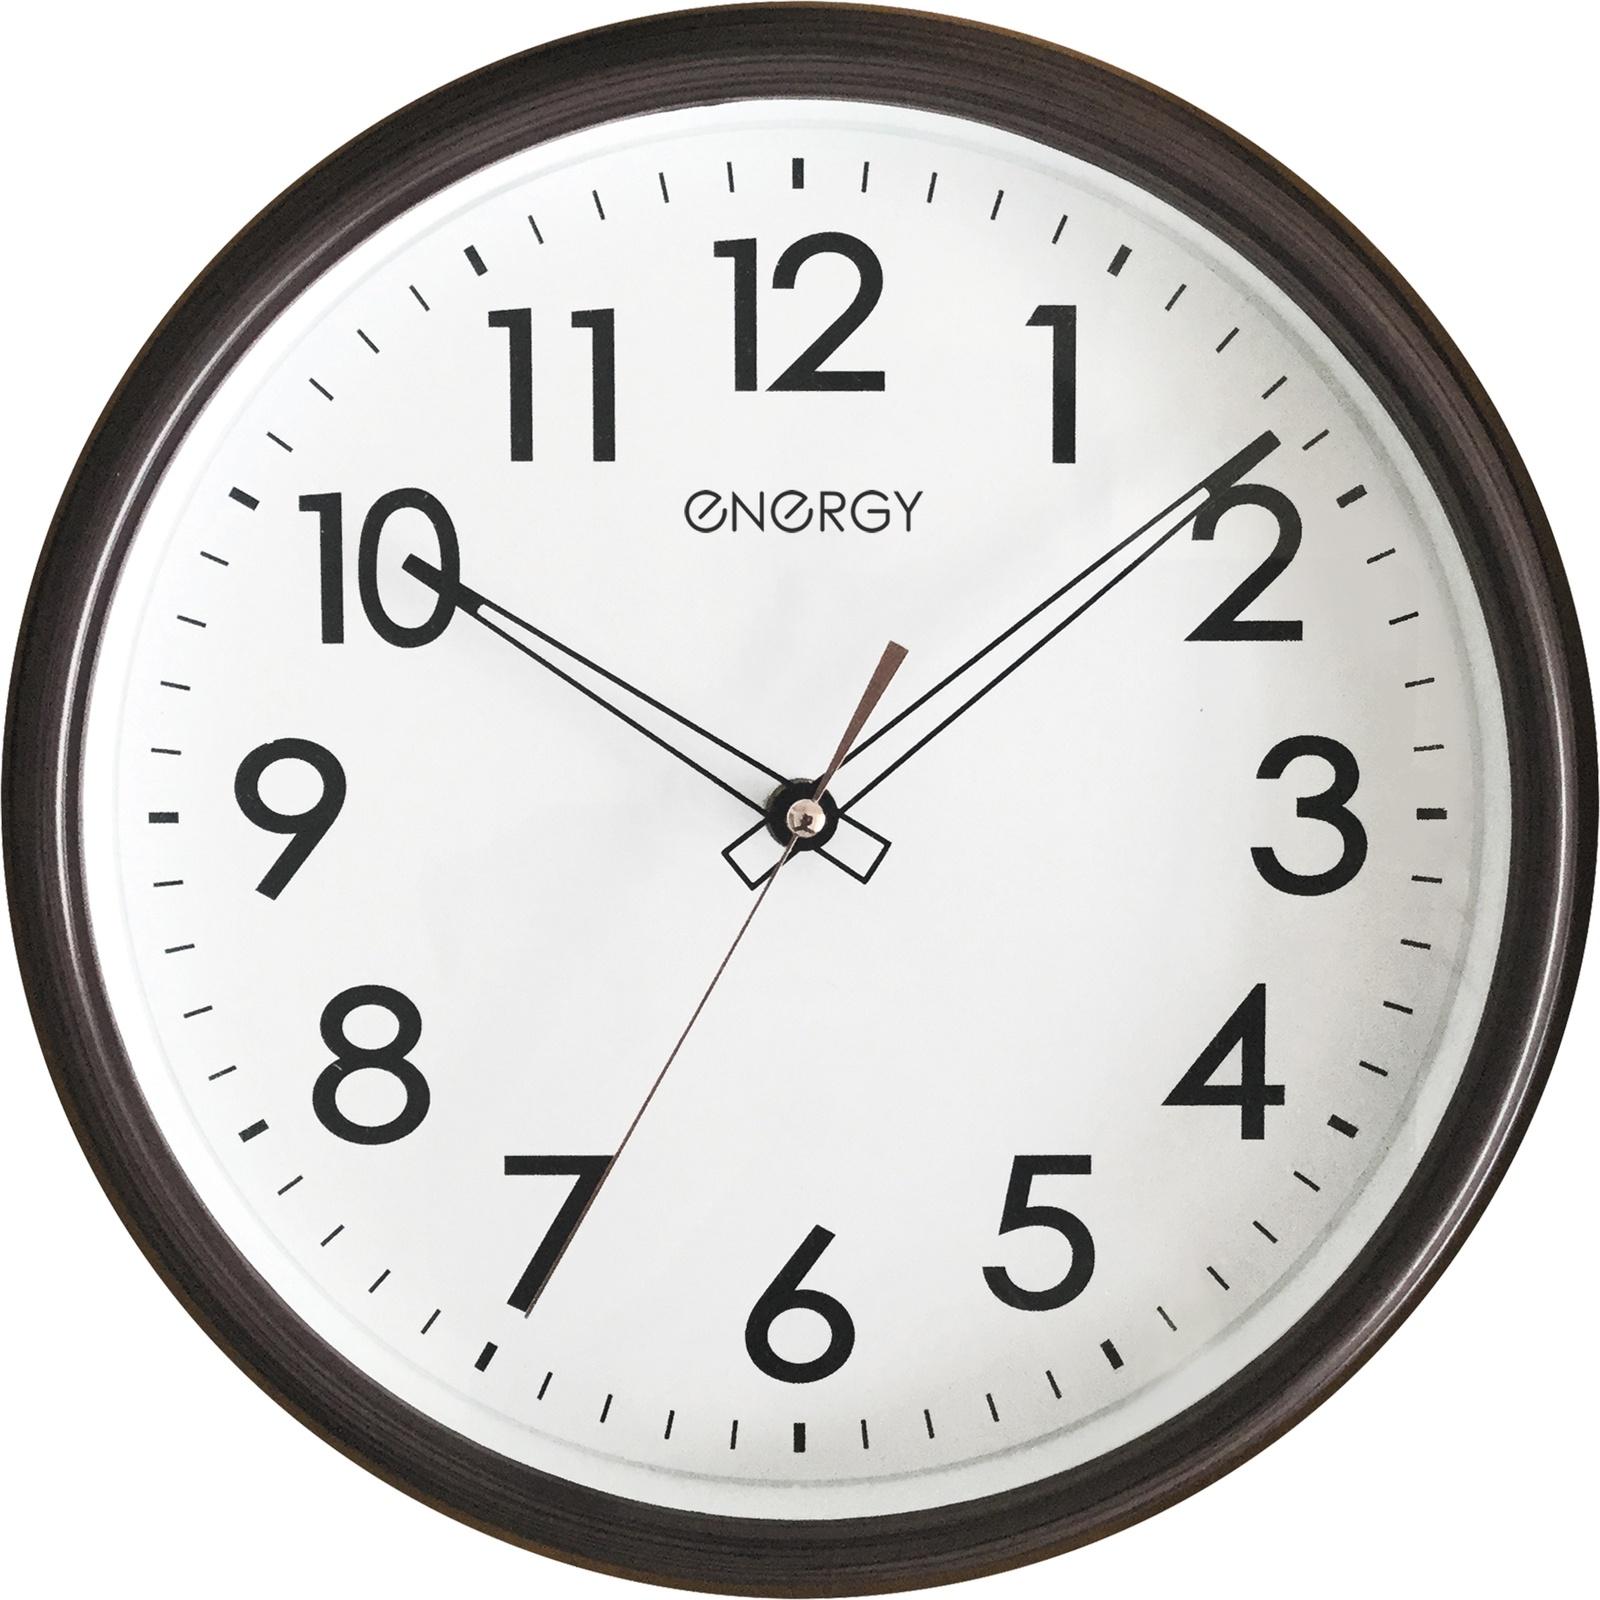 Часы настенные Energy ЕС-115, 54 009489, белый, коричневый цена